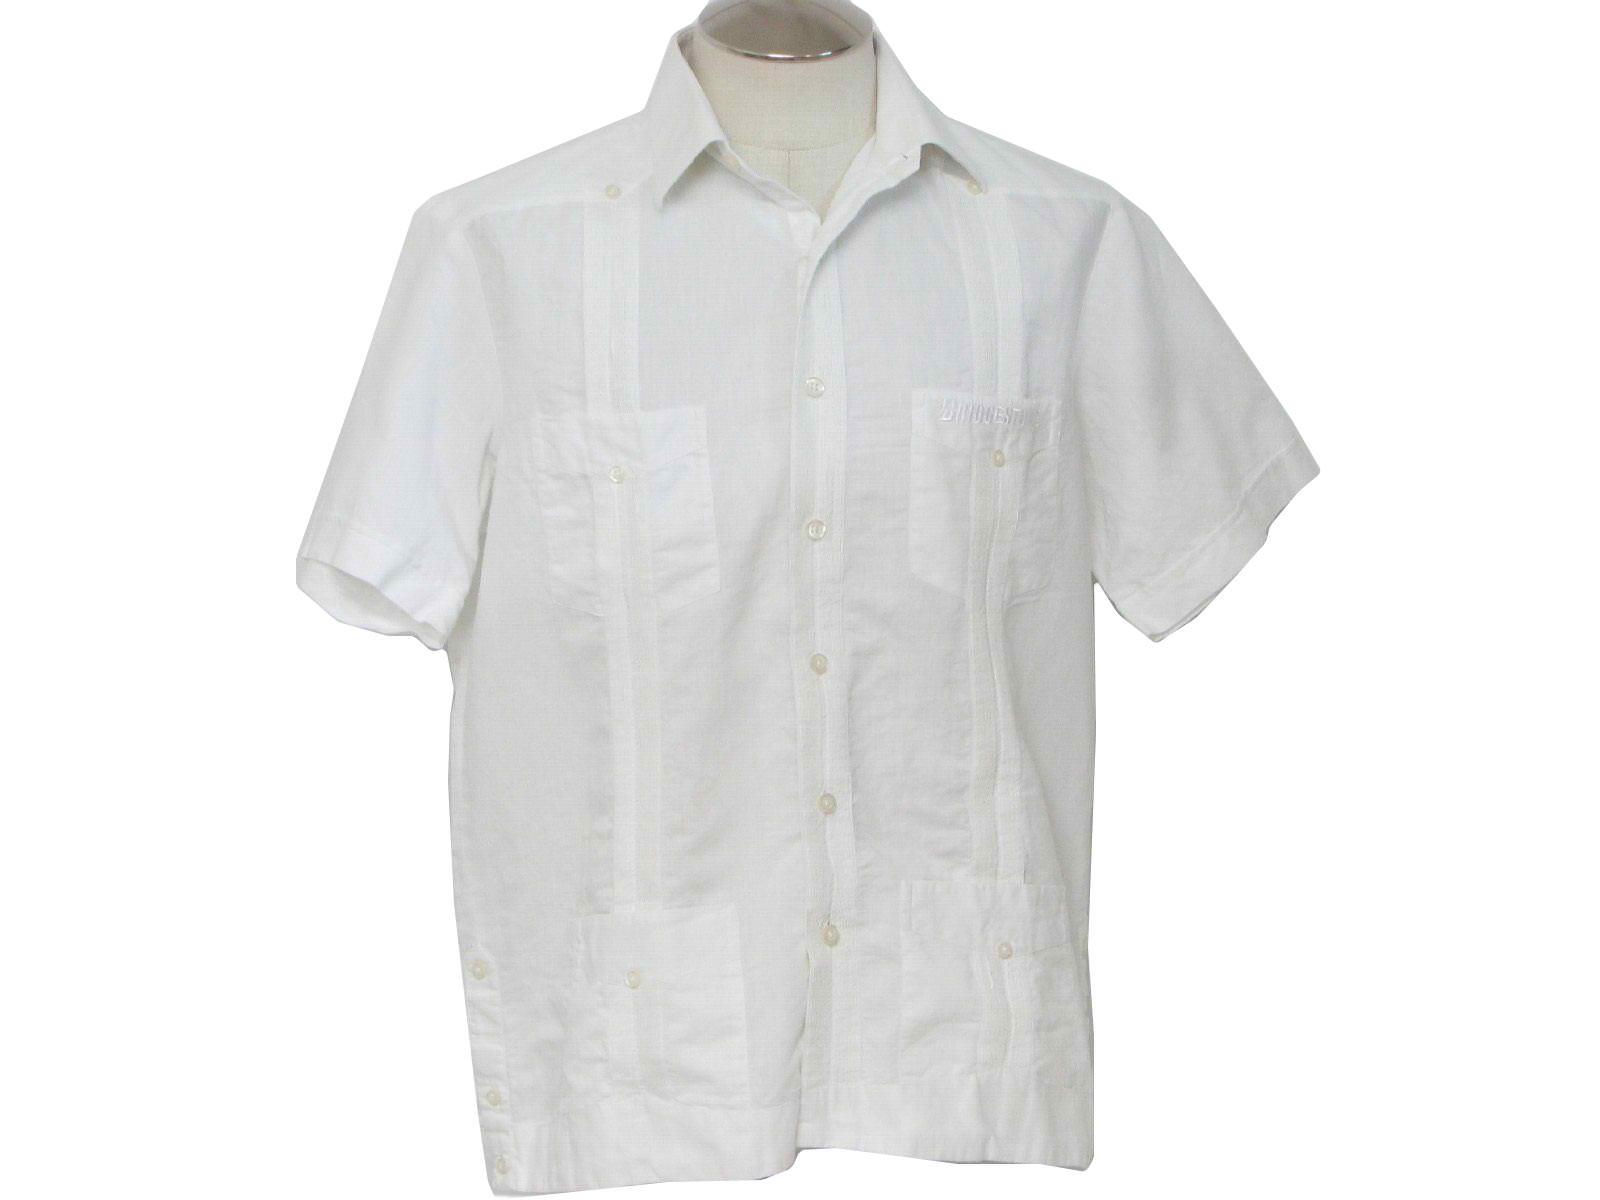 Mens Vintage Guayabera Shirts